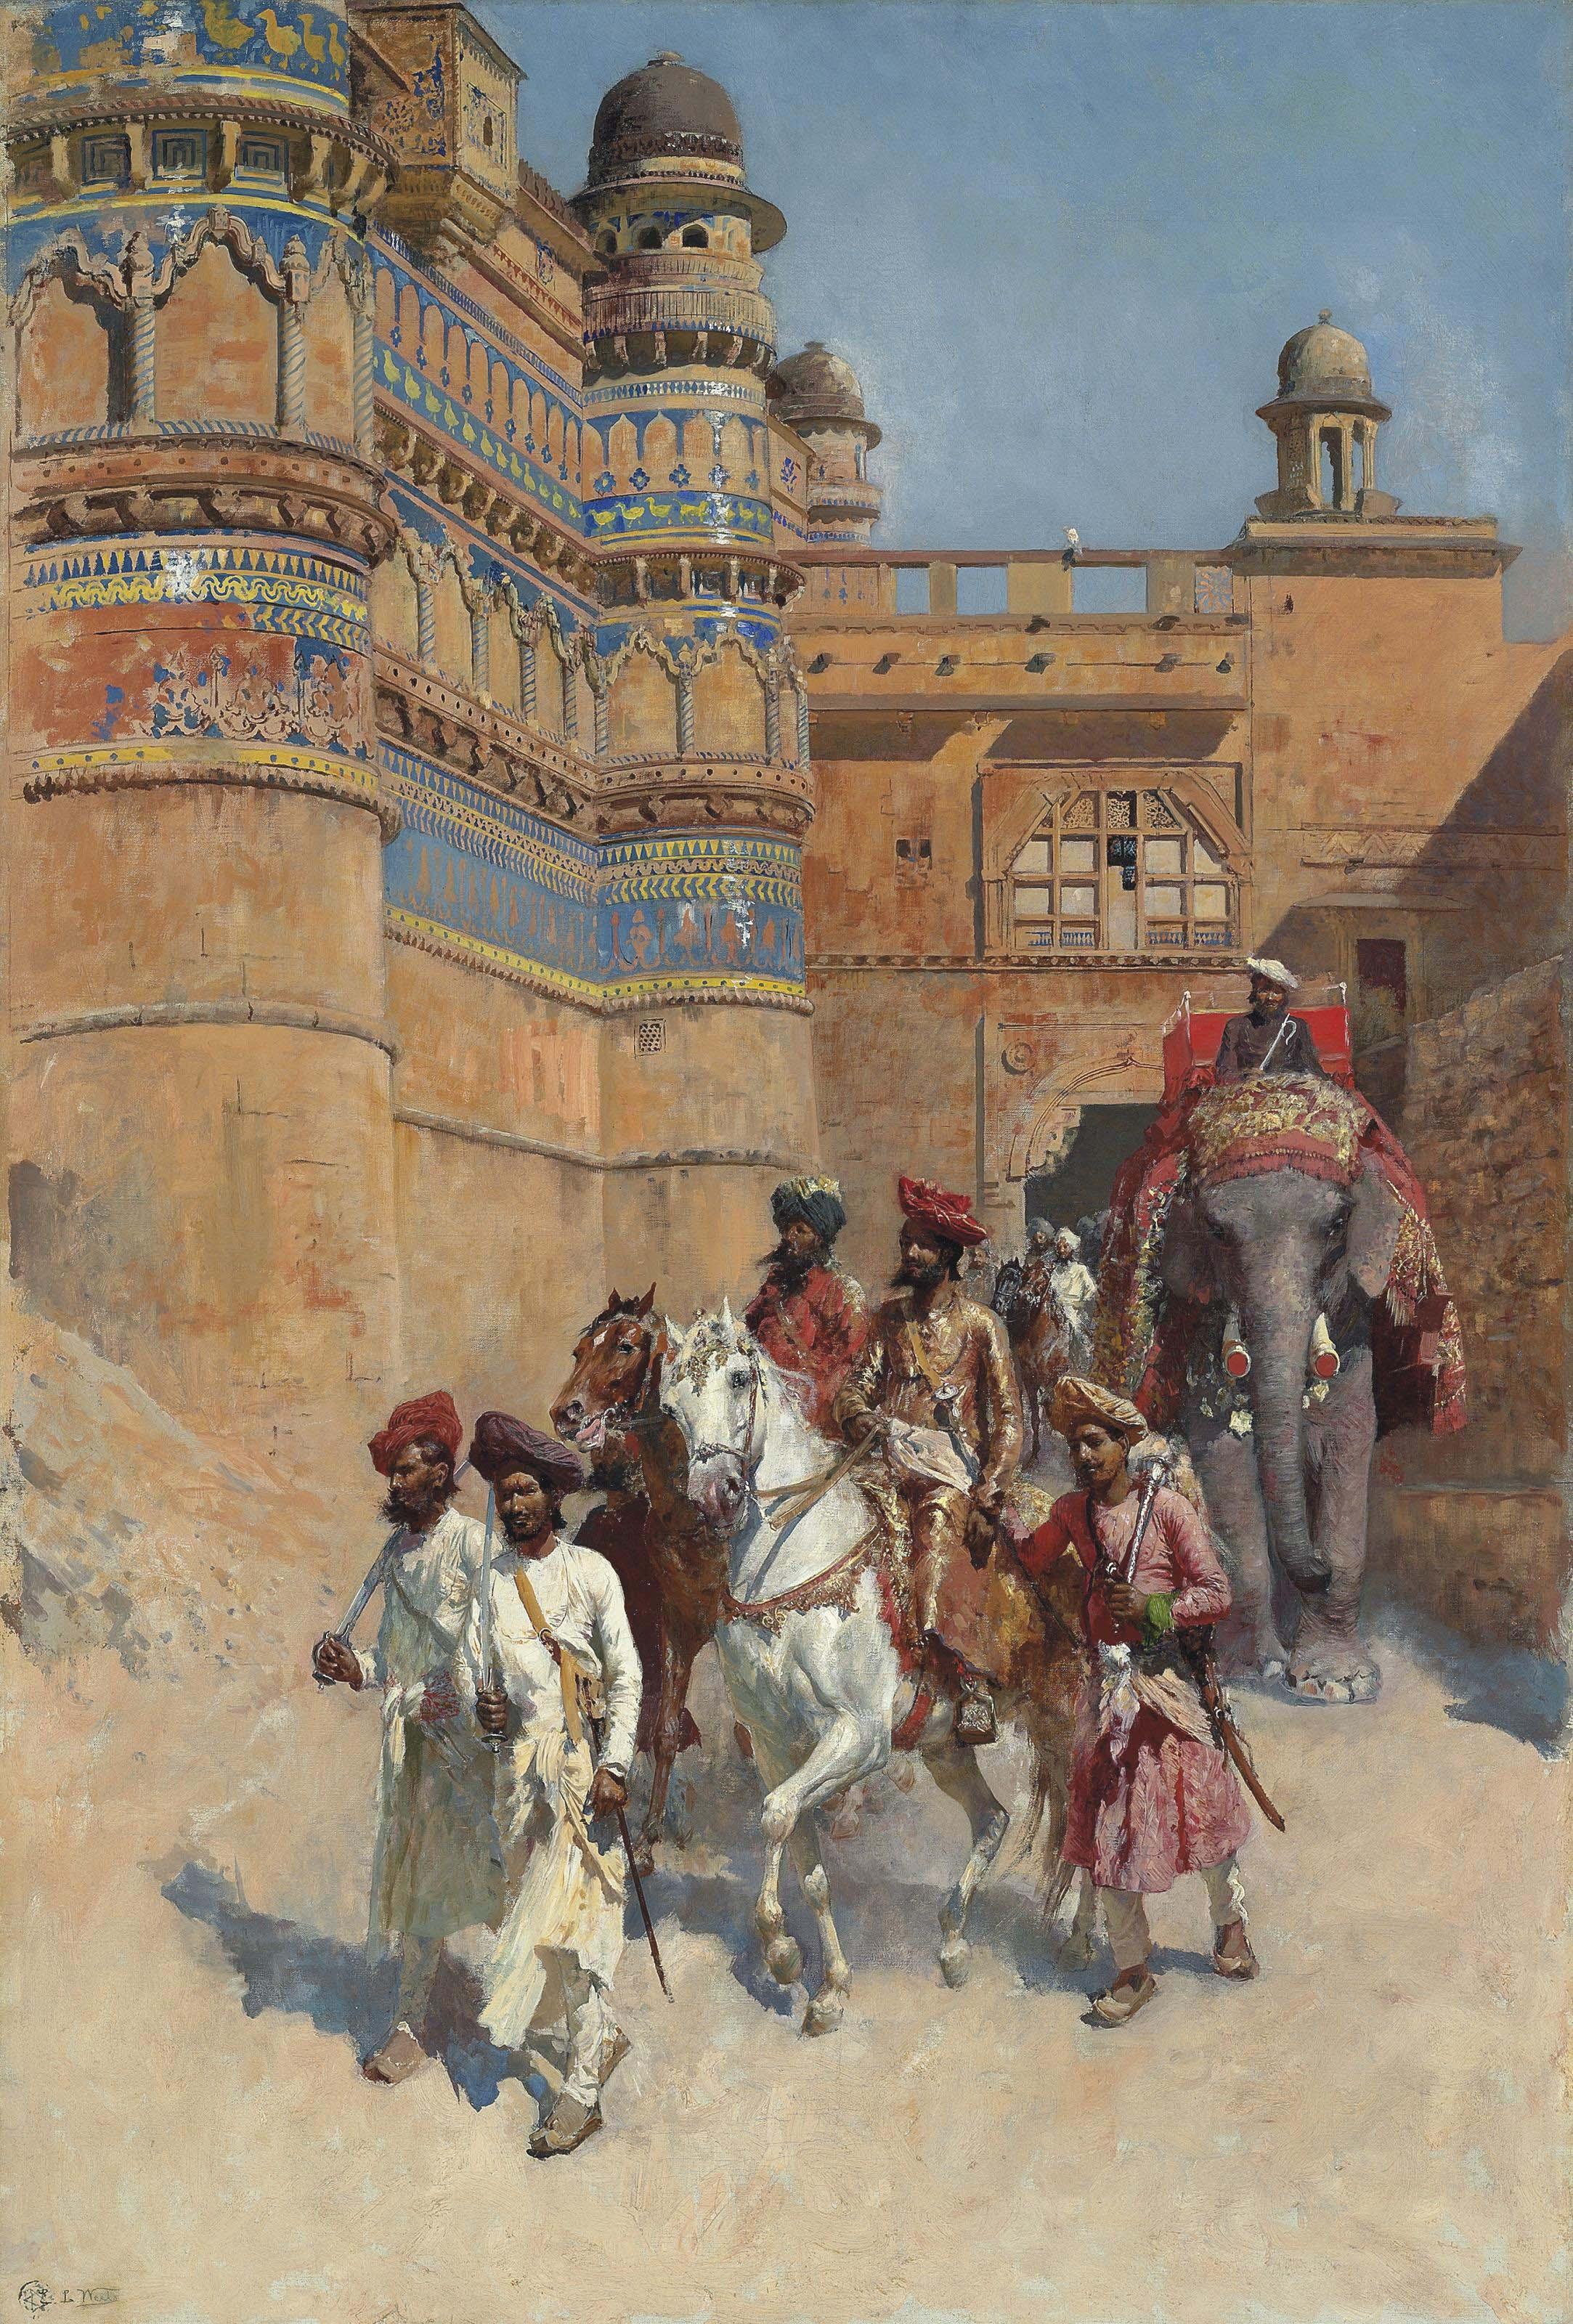 The Fort of Gwalior, Madhya Pradesh